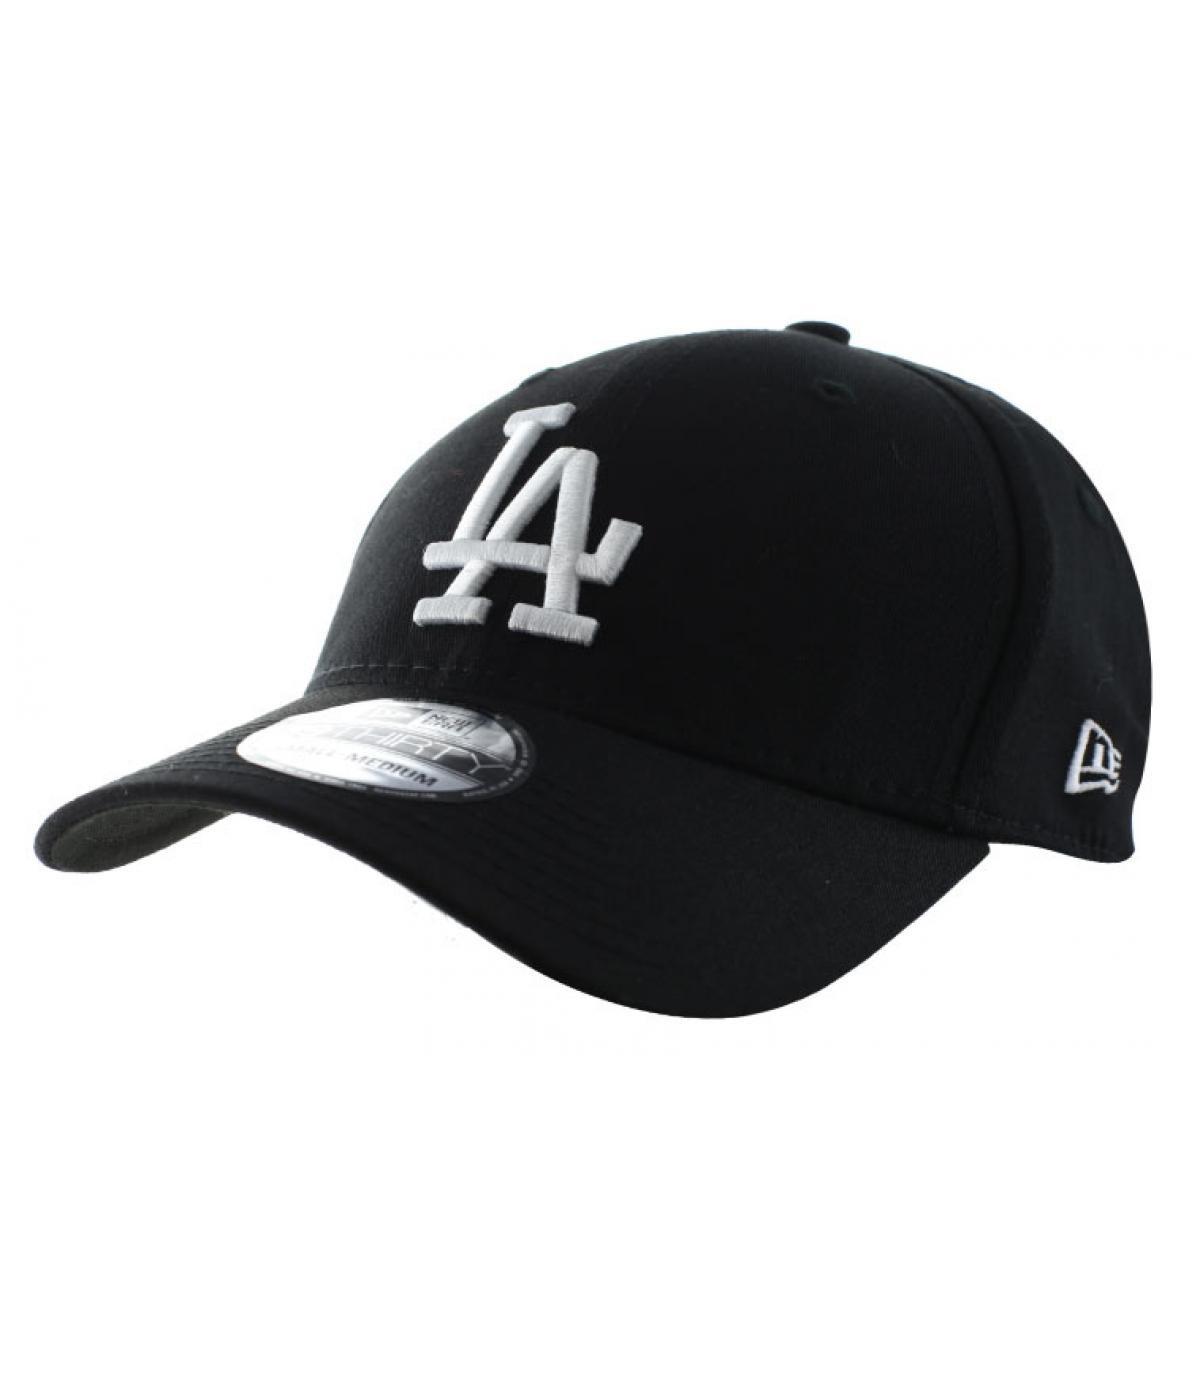 Details League Ess LA 39Thirty black white - Abbildung 2